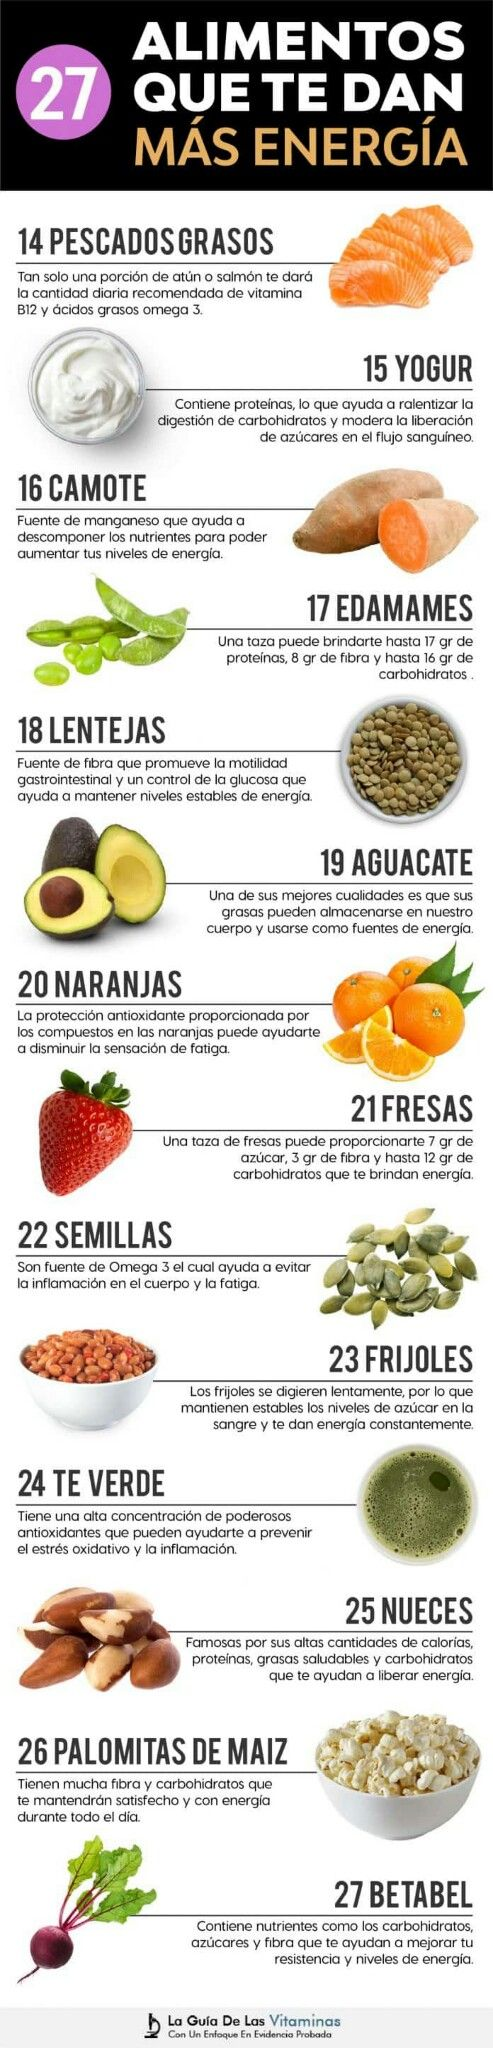 Pin De Nata Die En Alimentos Alimentos Nutricionales Alimentos Alimentos Saludables